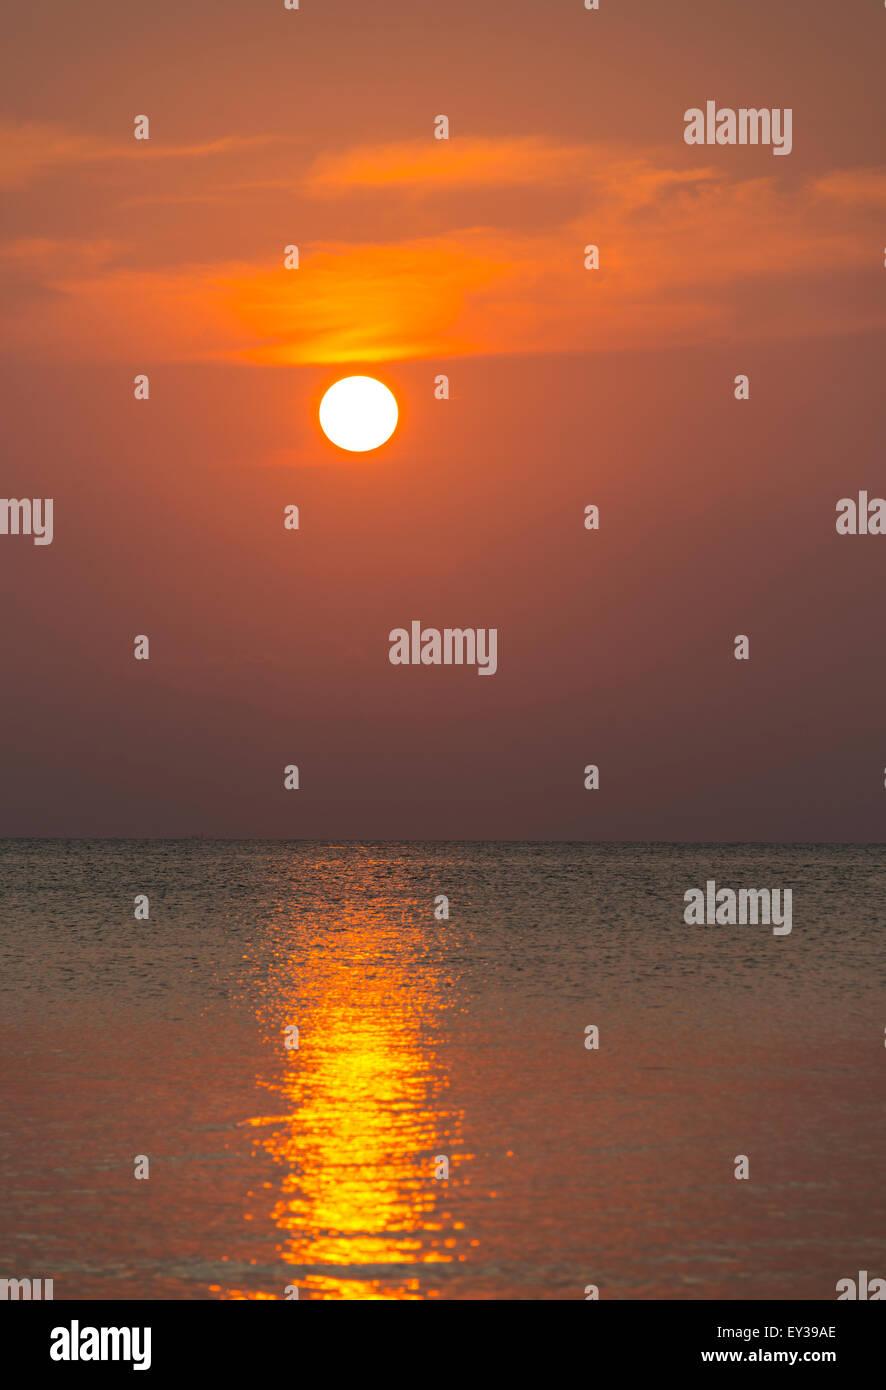 South China Sea at sunset, Gulf of Thailand, Koh Tao island, Thailand Stock Photo